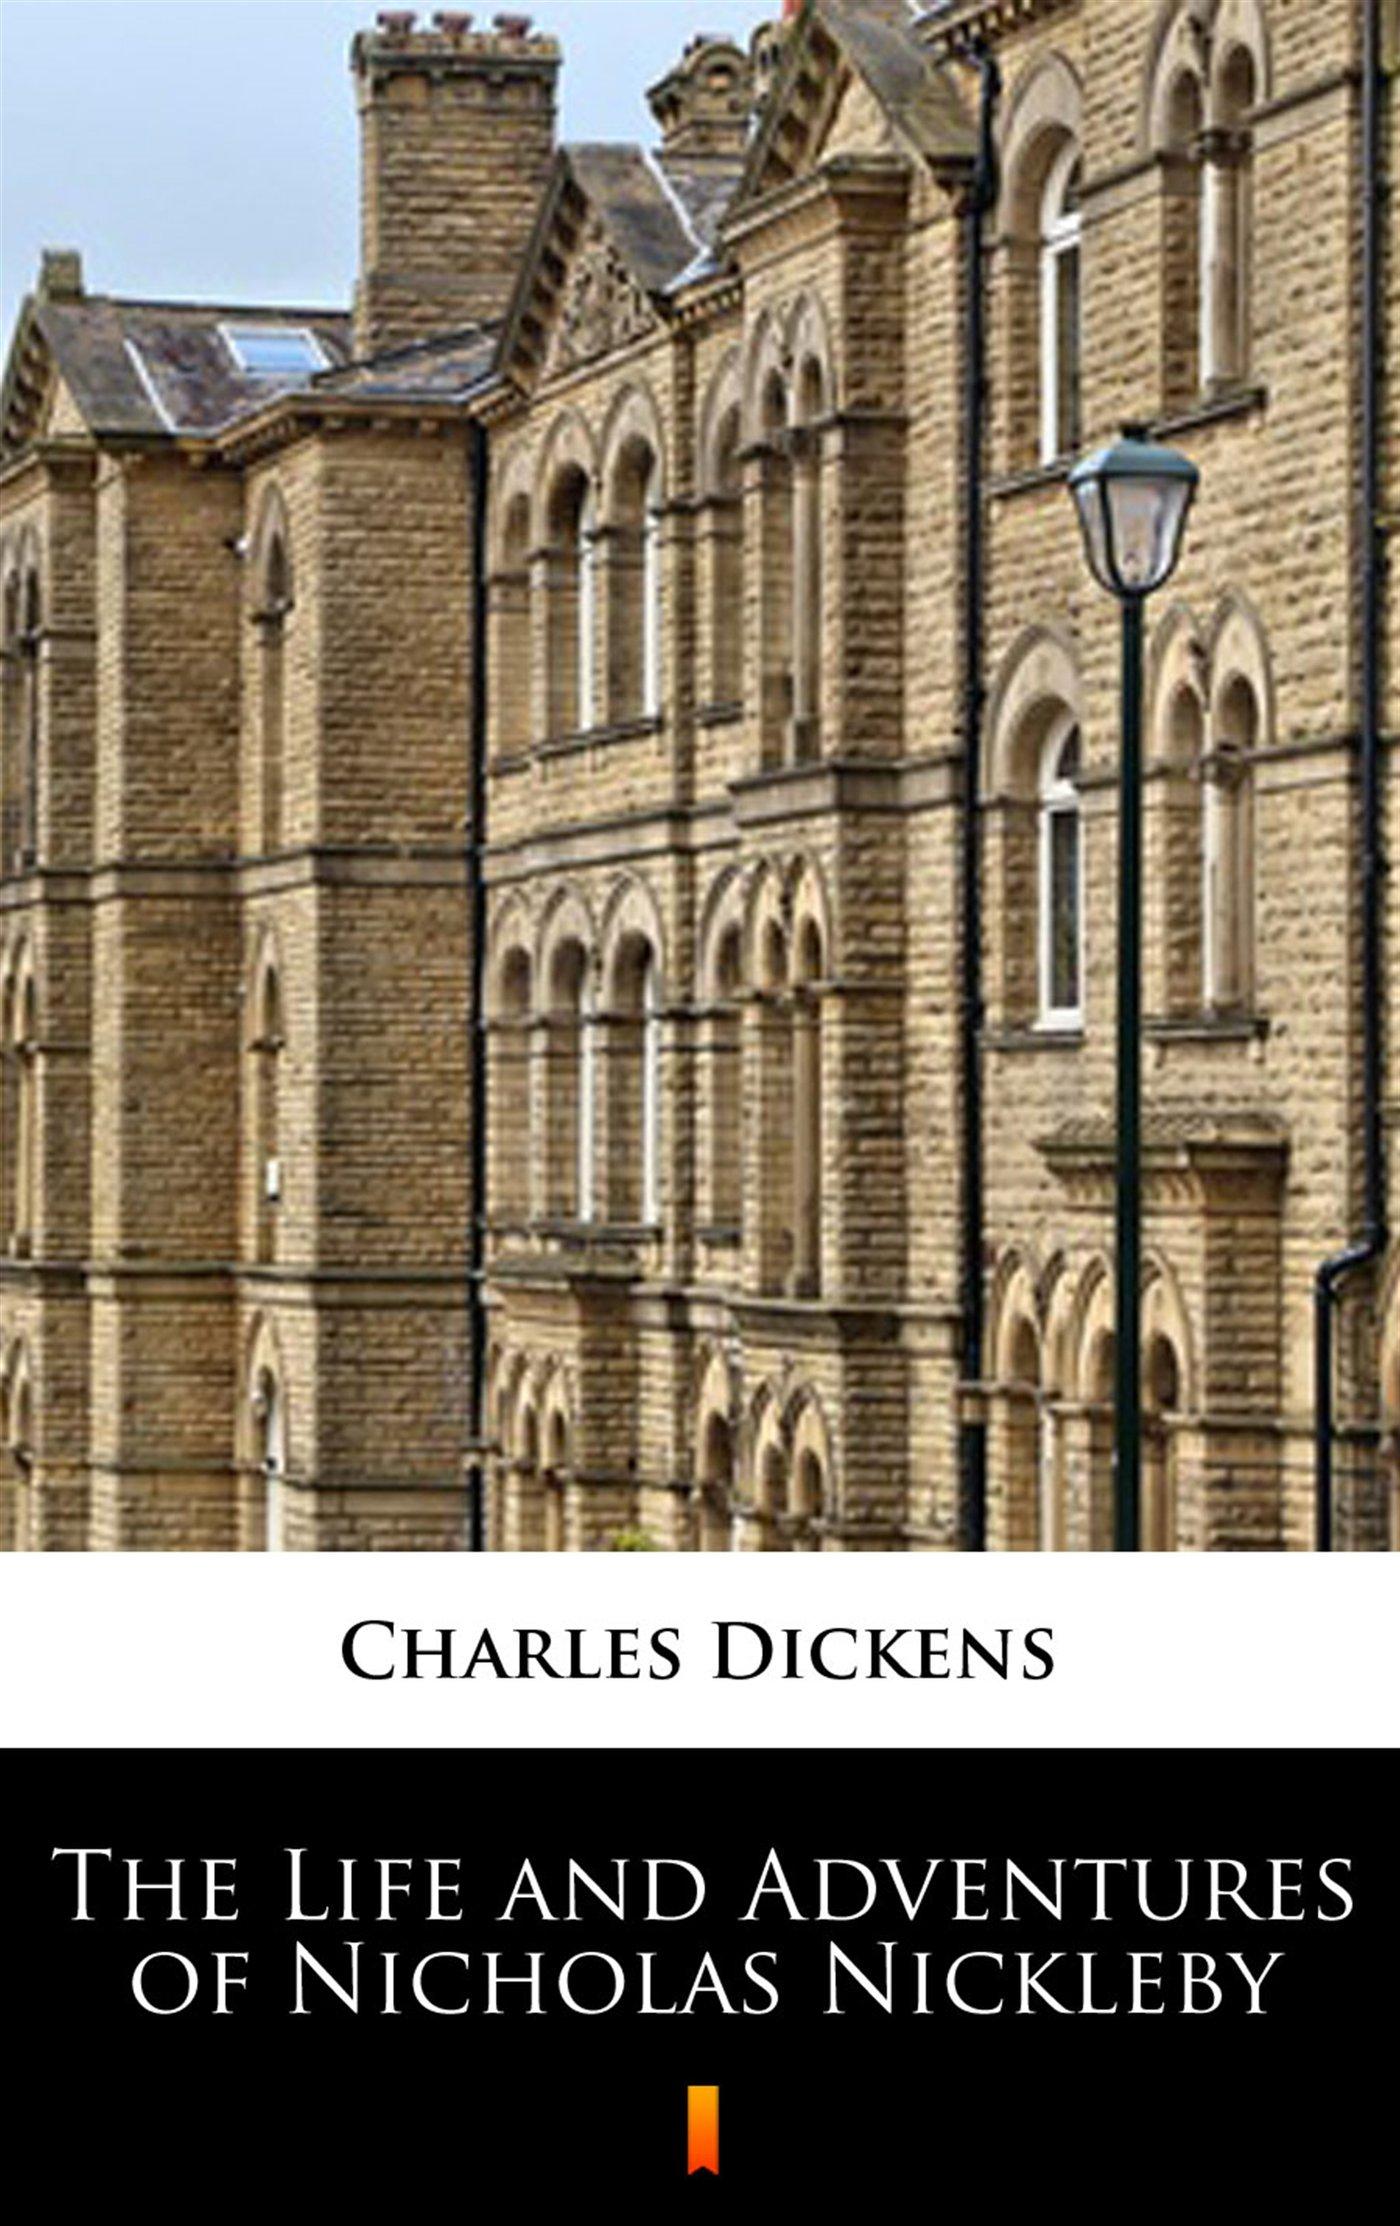 The Life and Adventures of Nicholas Nickleby - Ebook (Książka EPUB) do pobrania w formacie EPUB